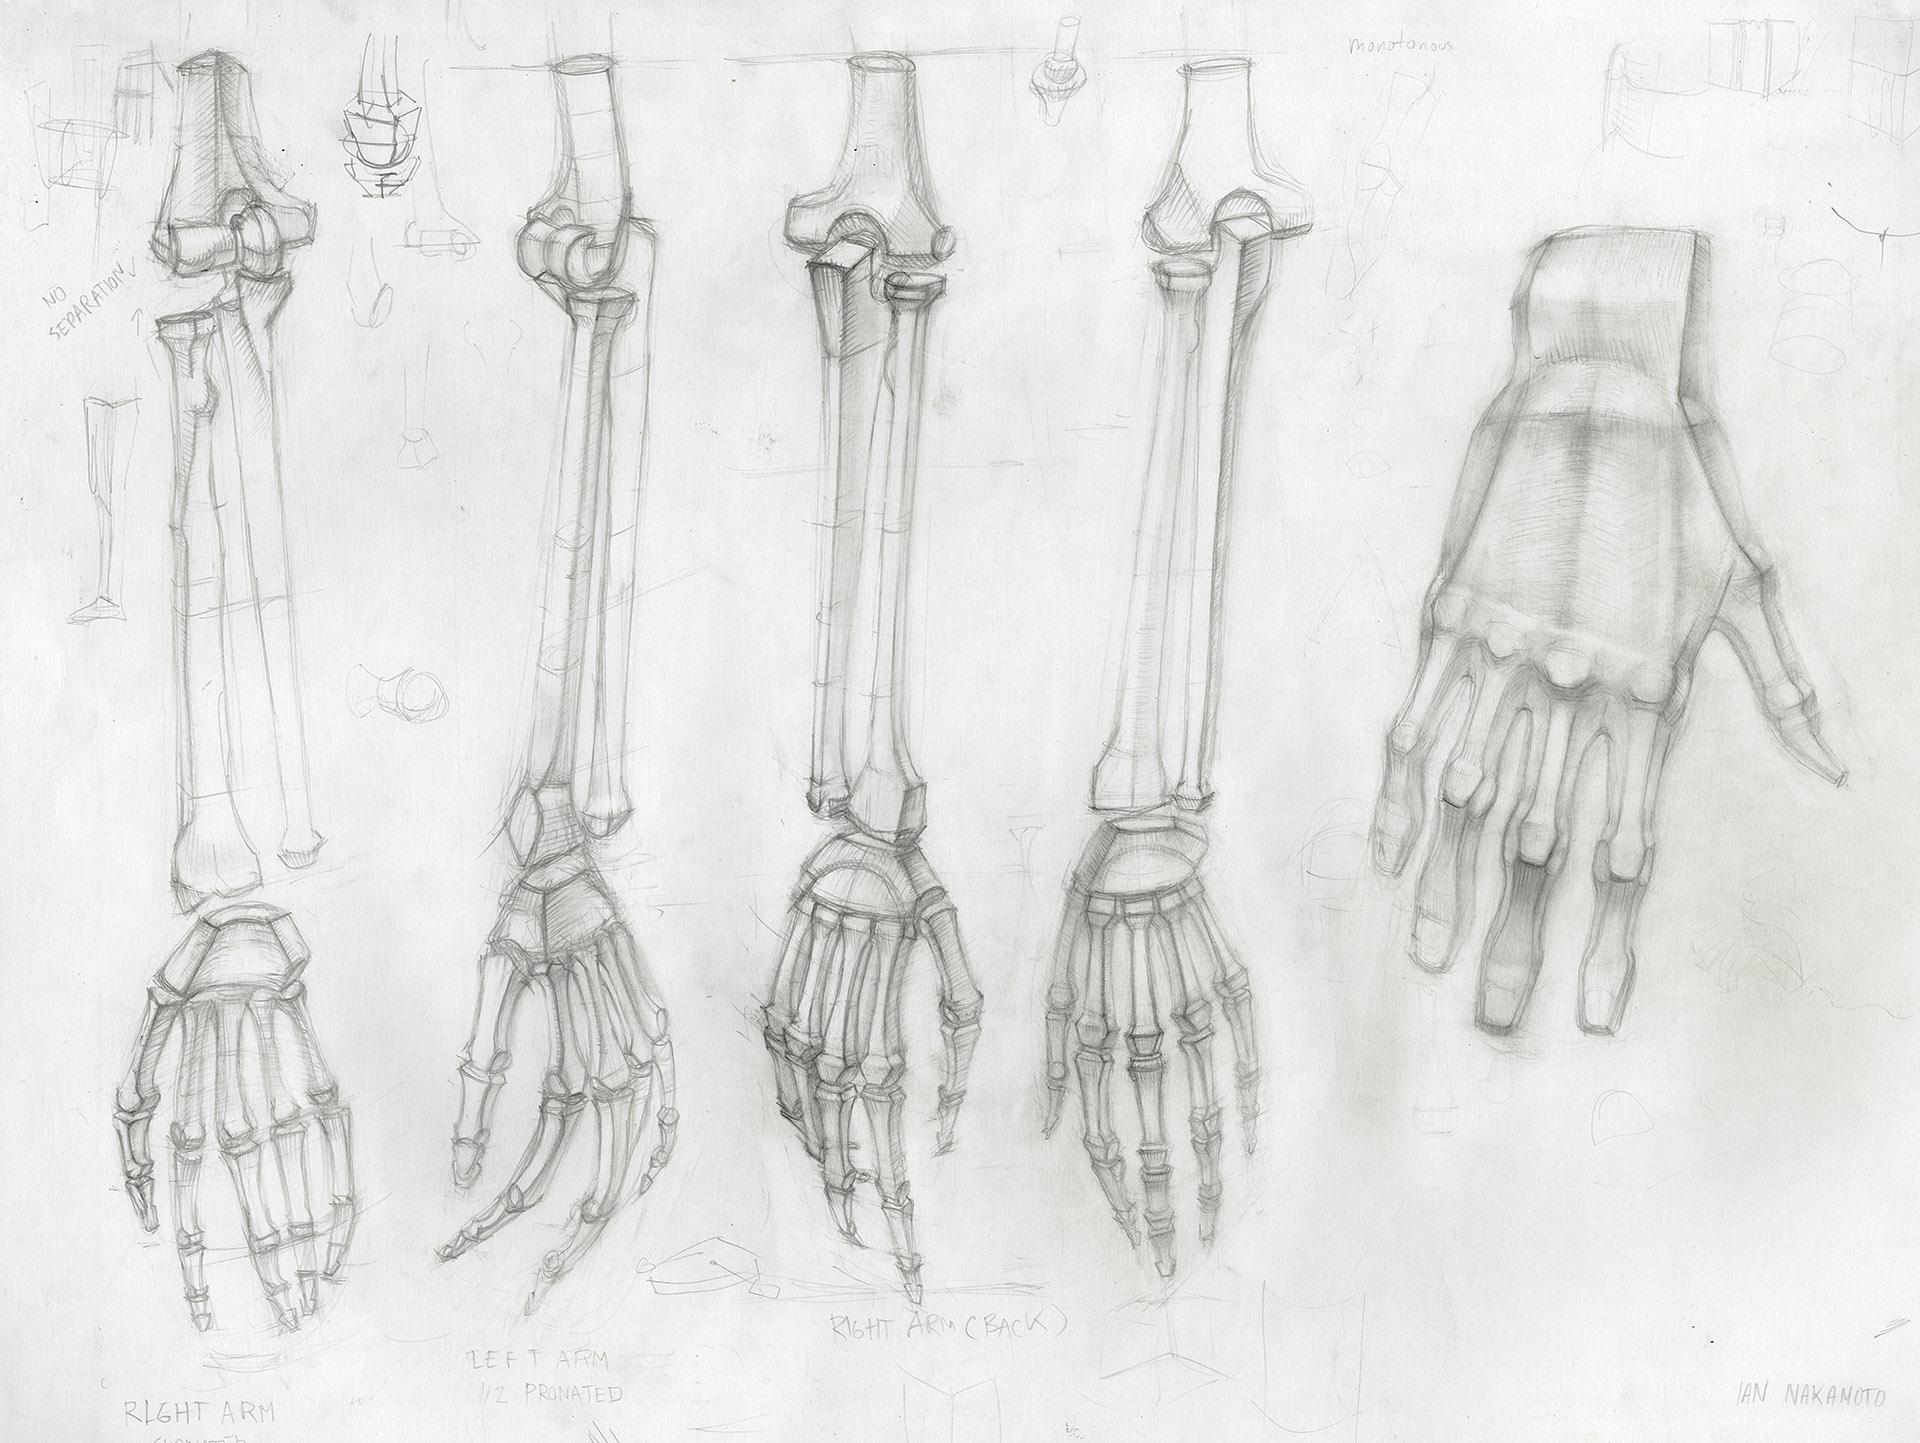 Ian-Nakamoto-Planar-Drawing-Academic-Study-Hands-1920